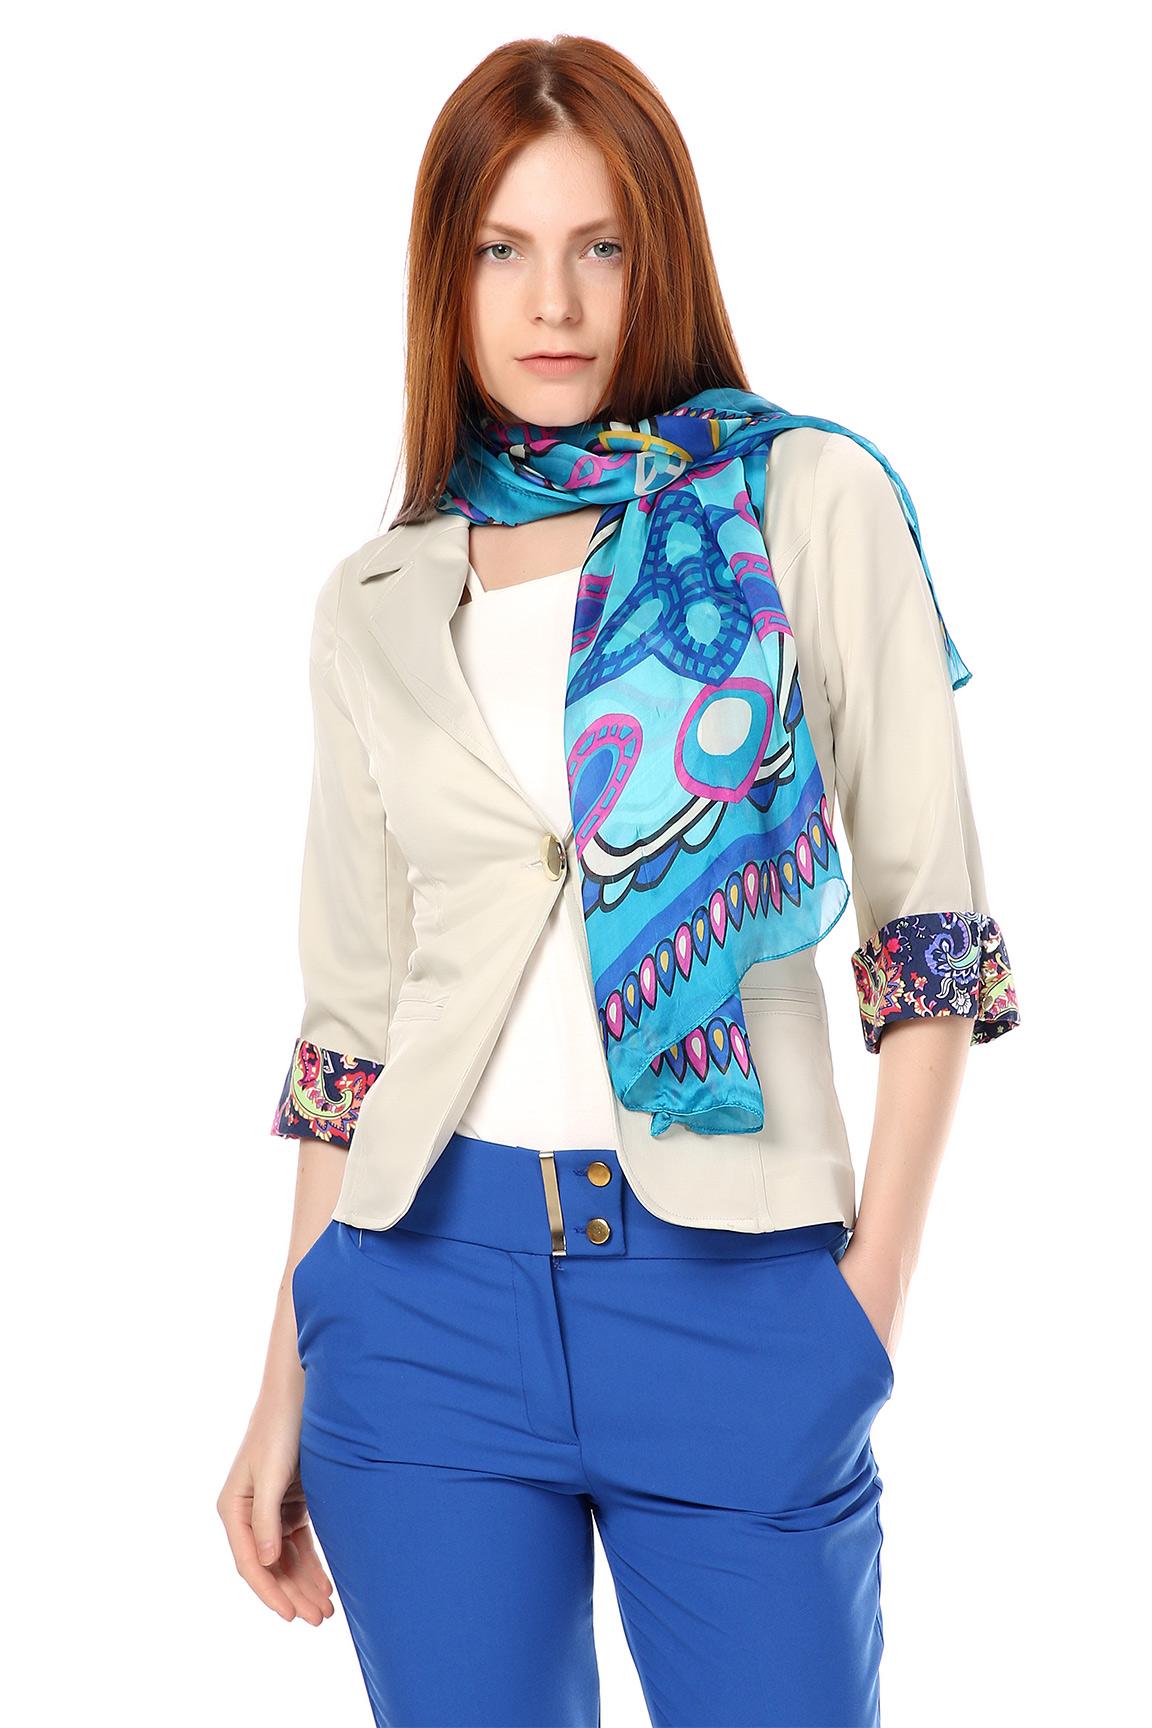 551631f0d49f3 جواكت نسائيه طويله و قصيره صيف 2015 – 2016 – 6 – Arab Fashion